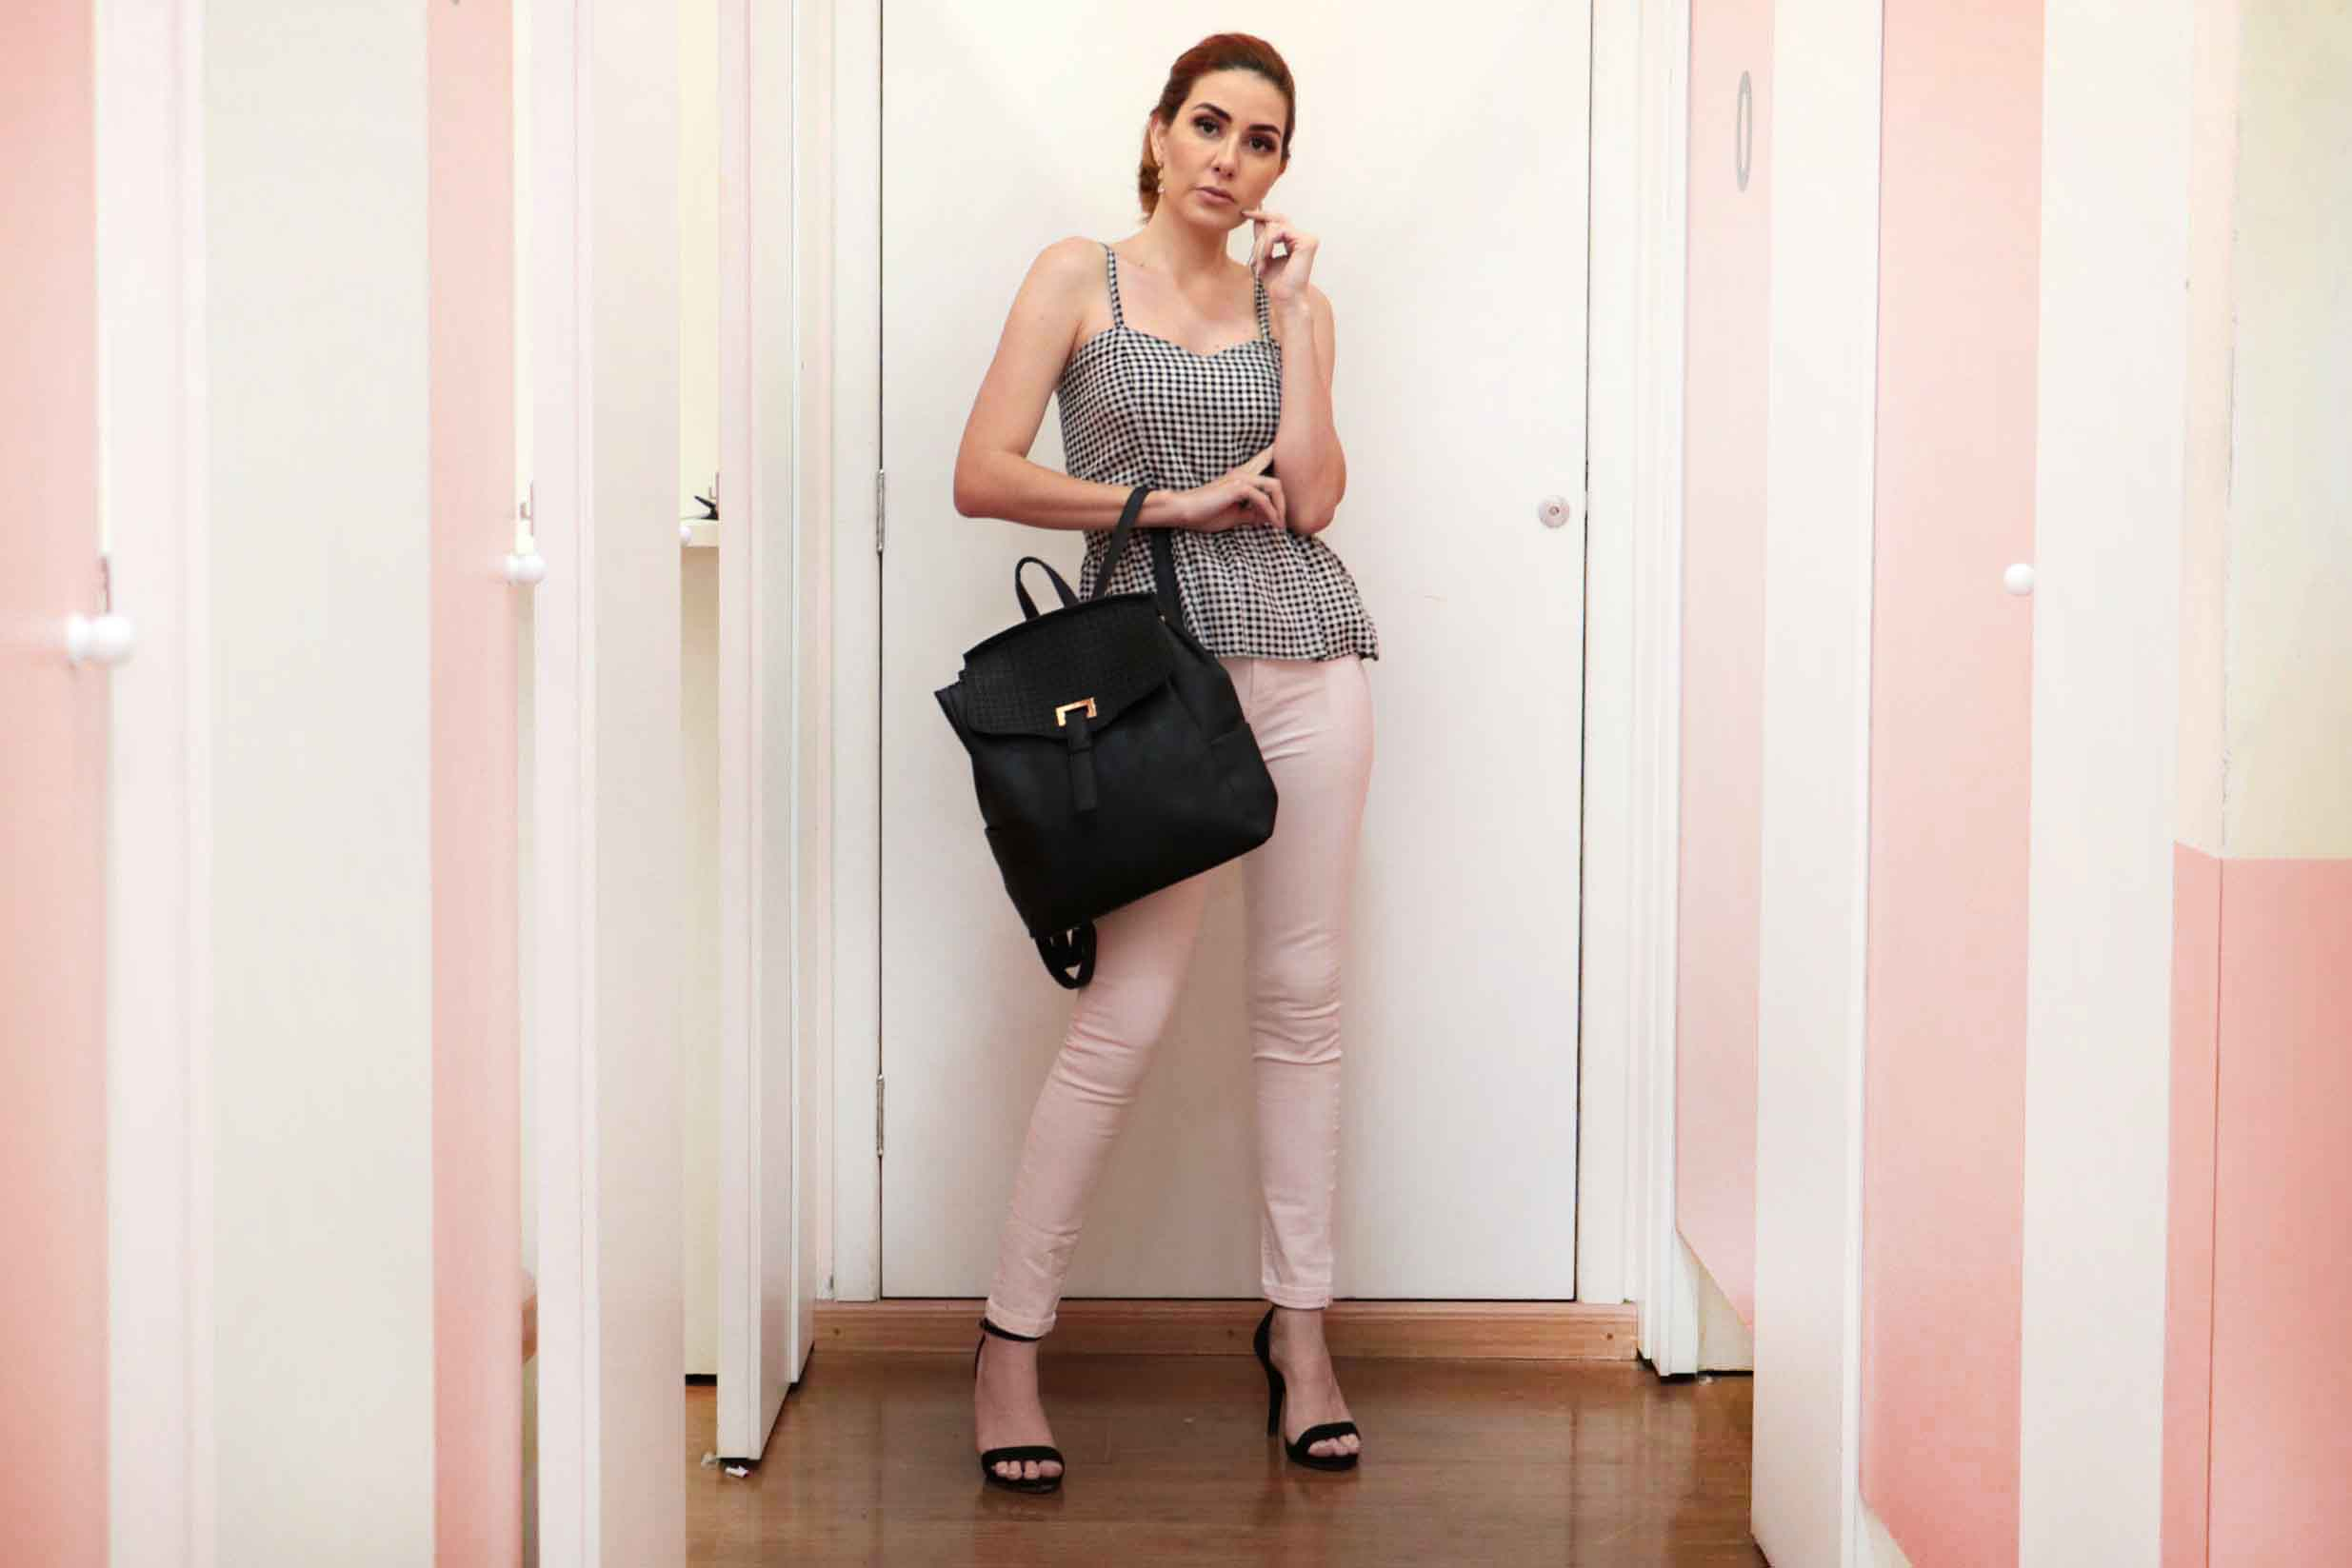 Regata vichy, calça hot pants jeans rose e mochila preta